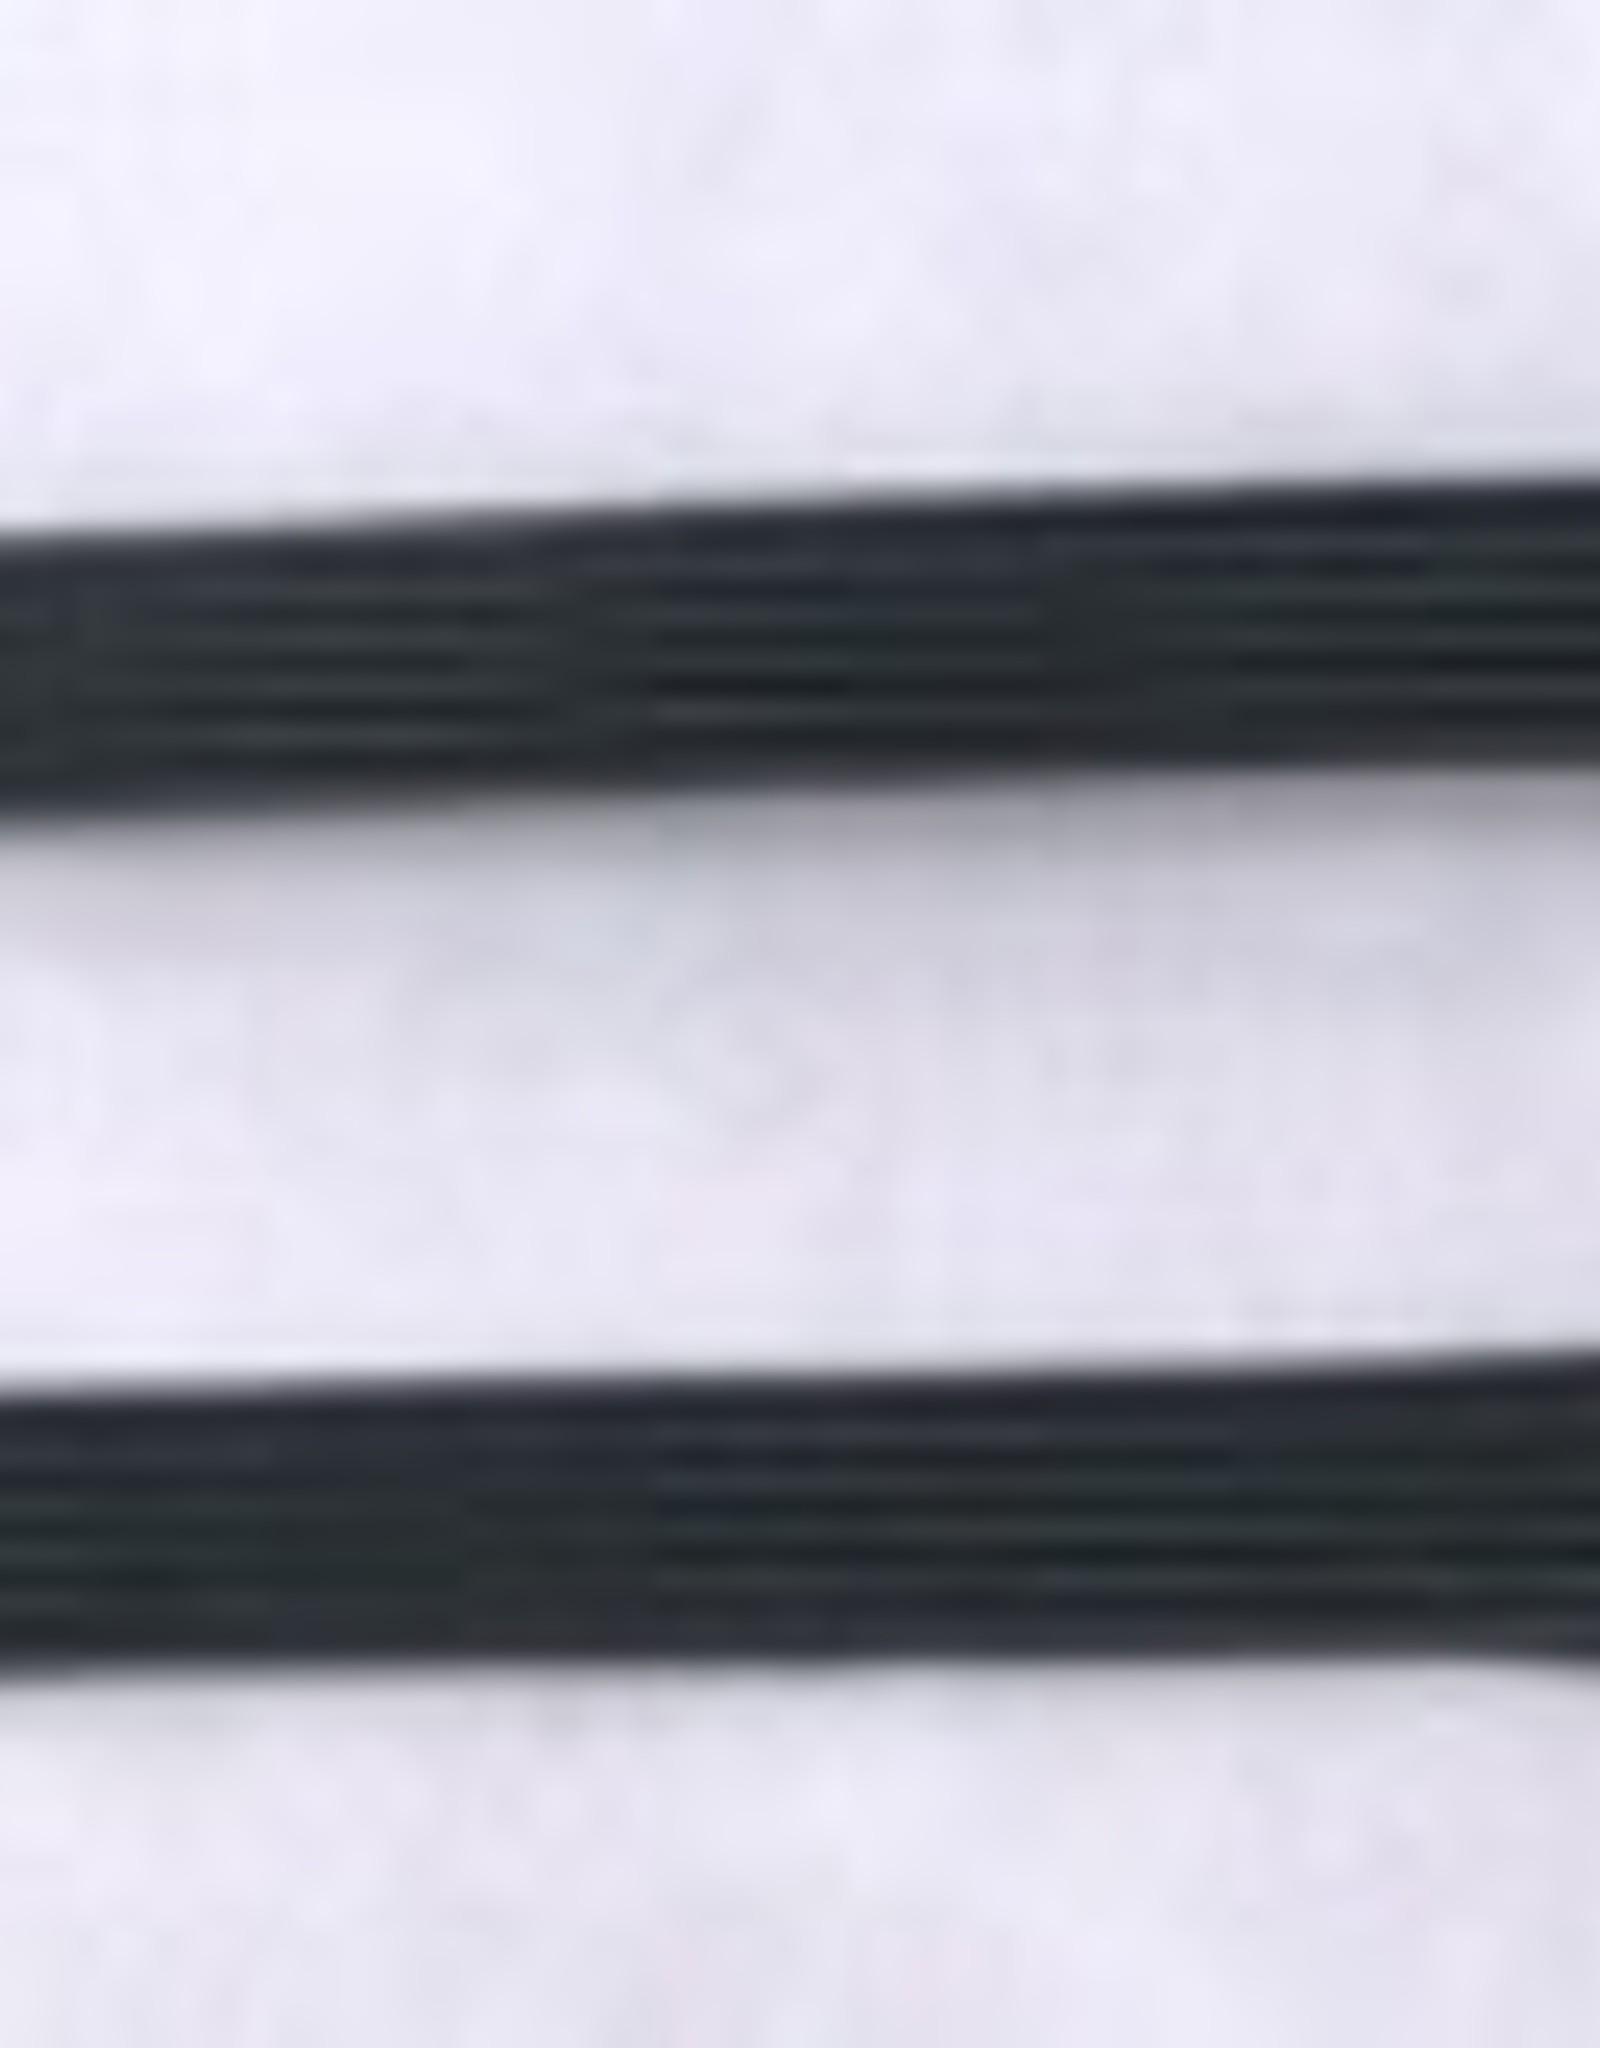 TQ Racing 200mm-tq-flat-wire-sensor-cable